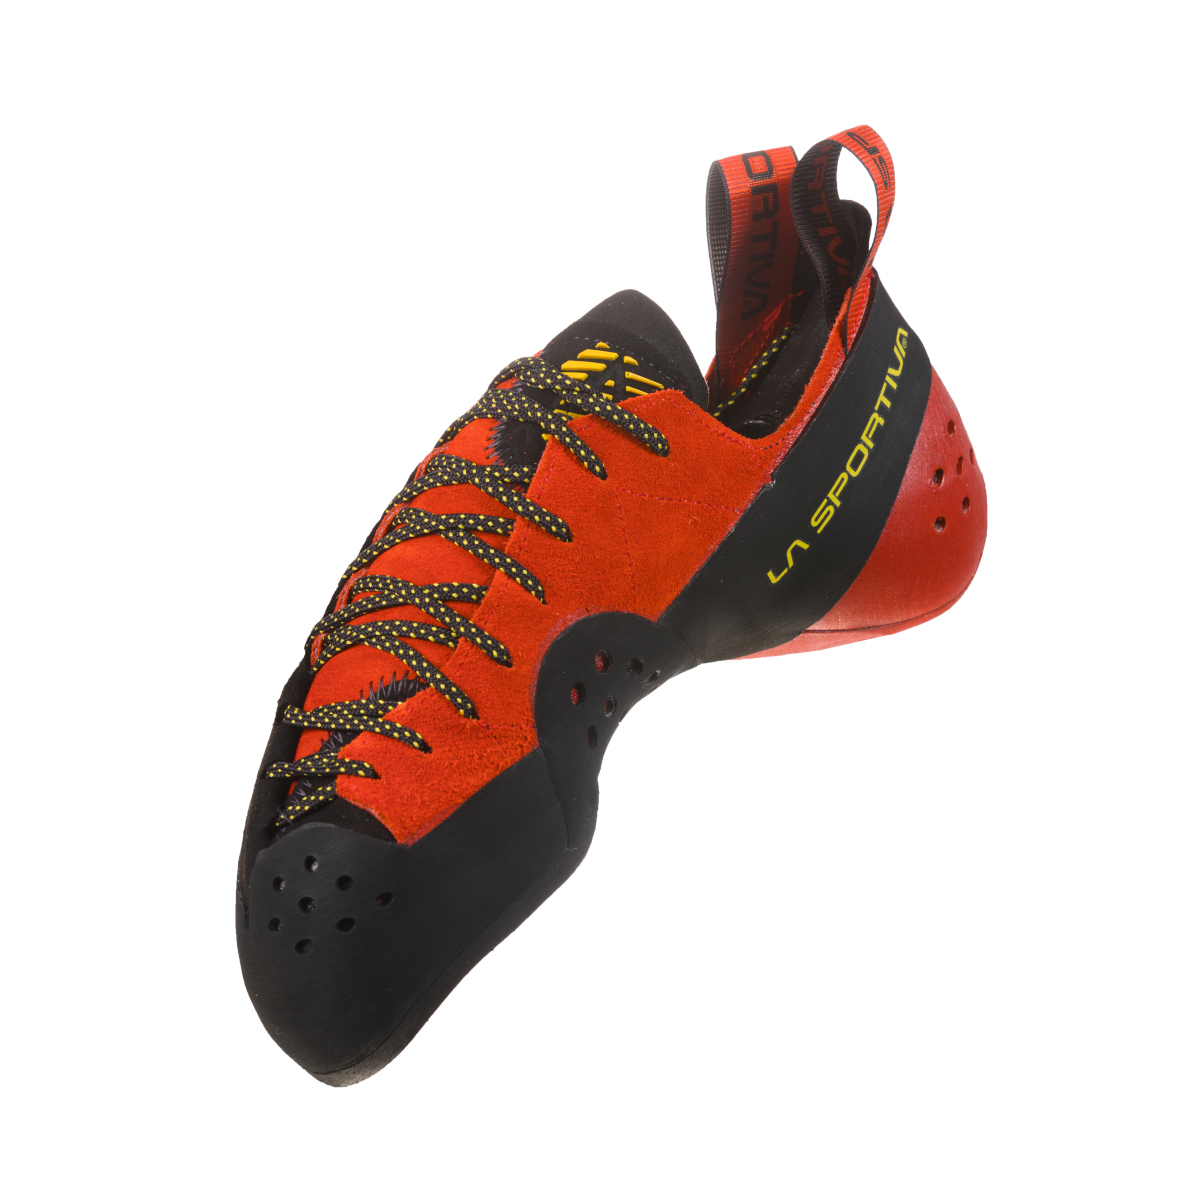 ... Testarossa Climbing Shoe ...